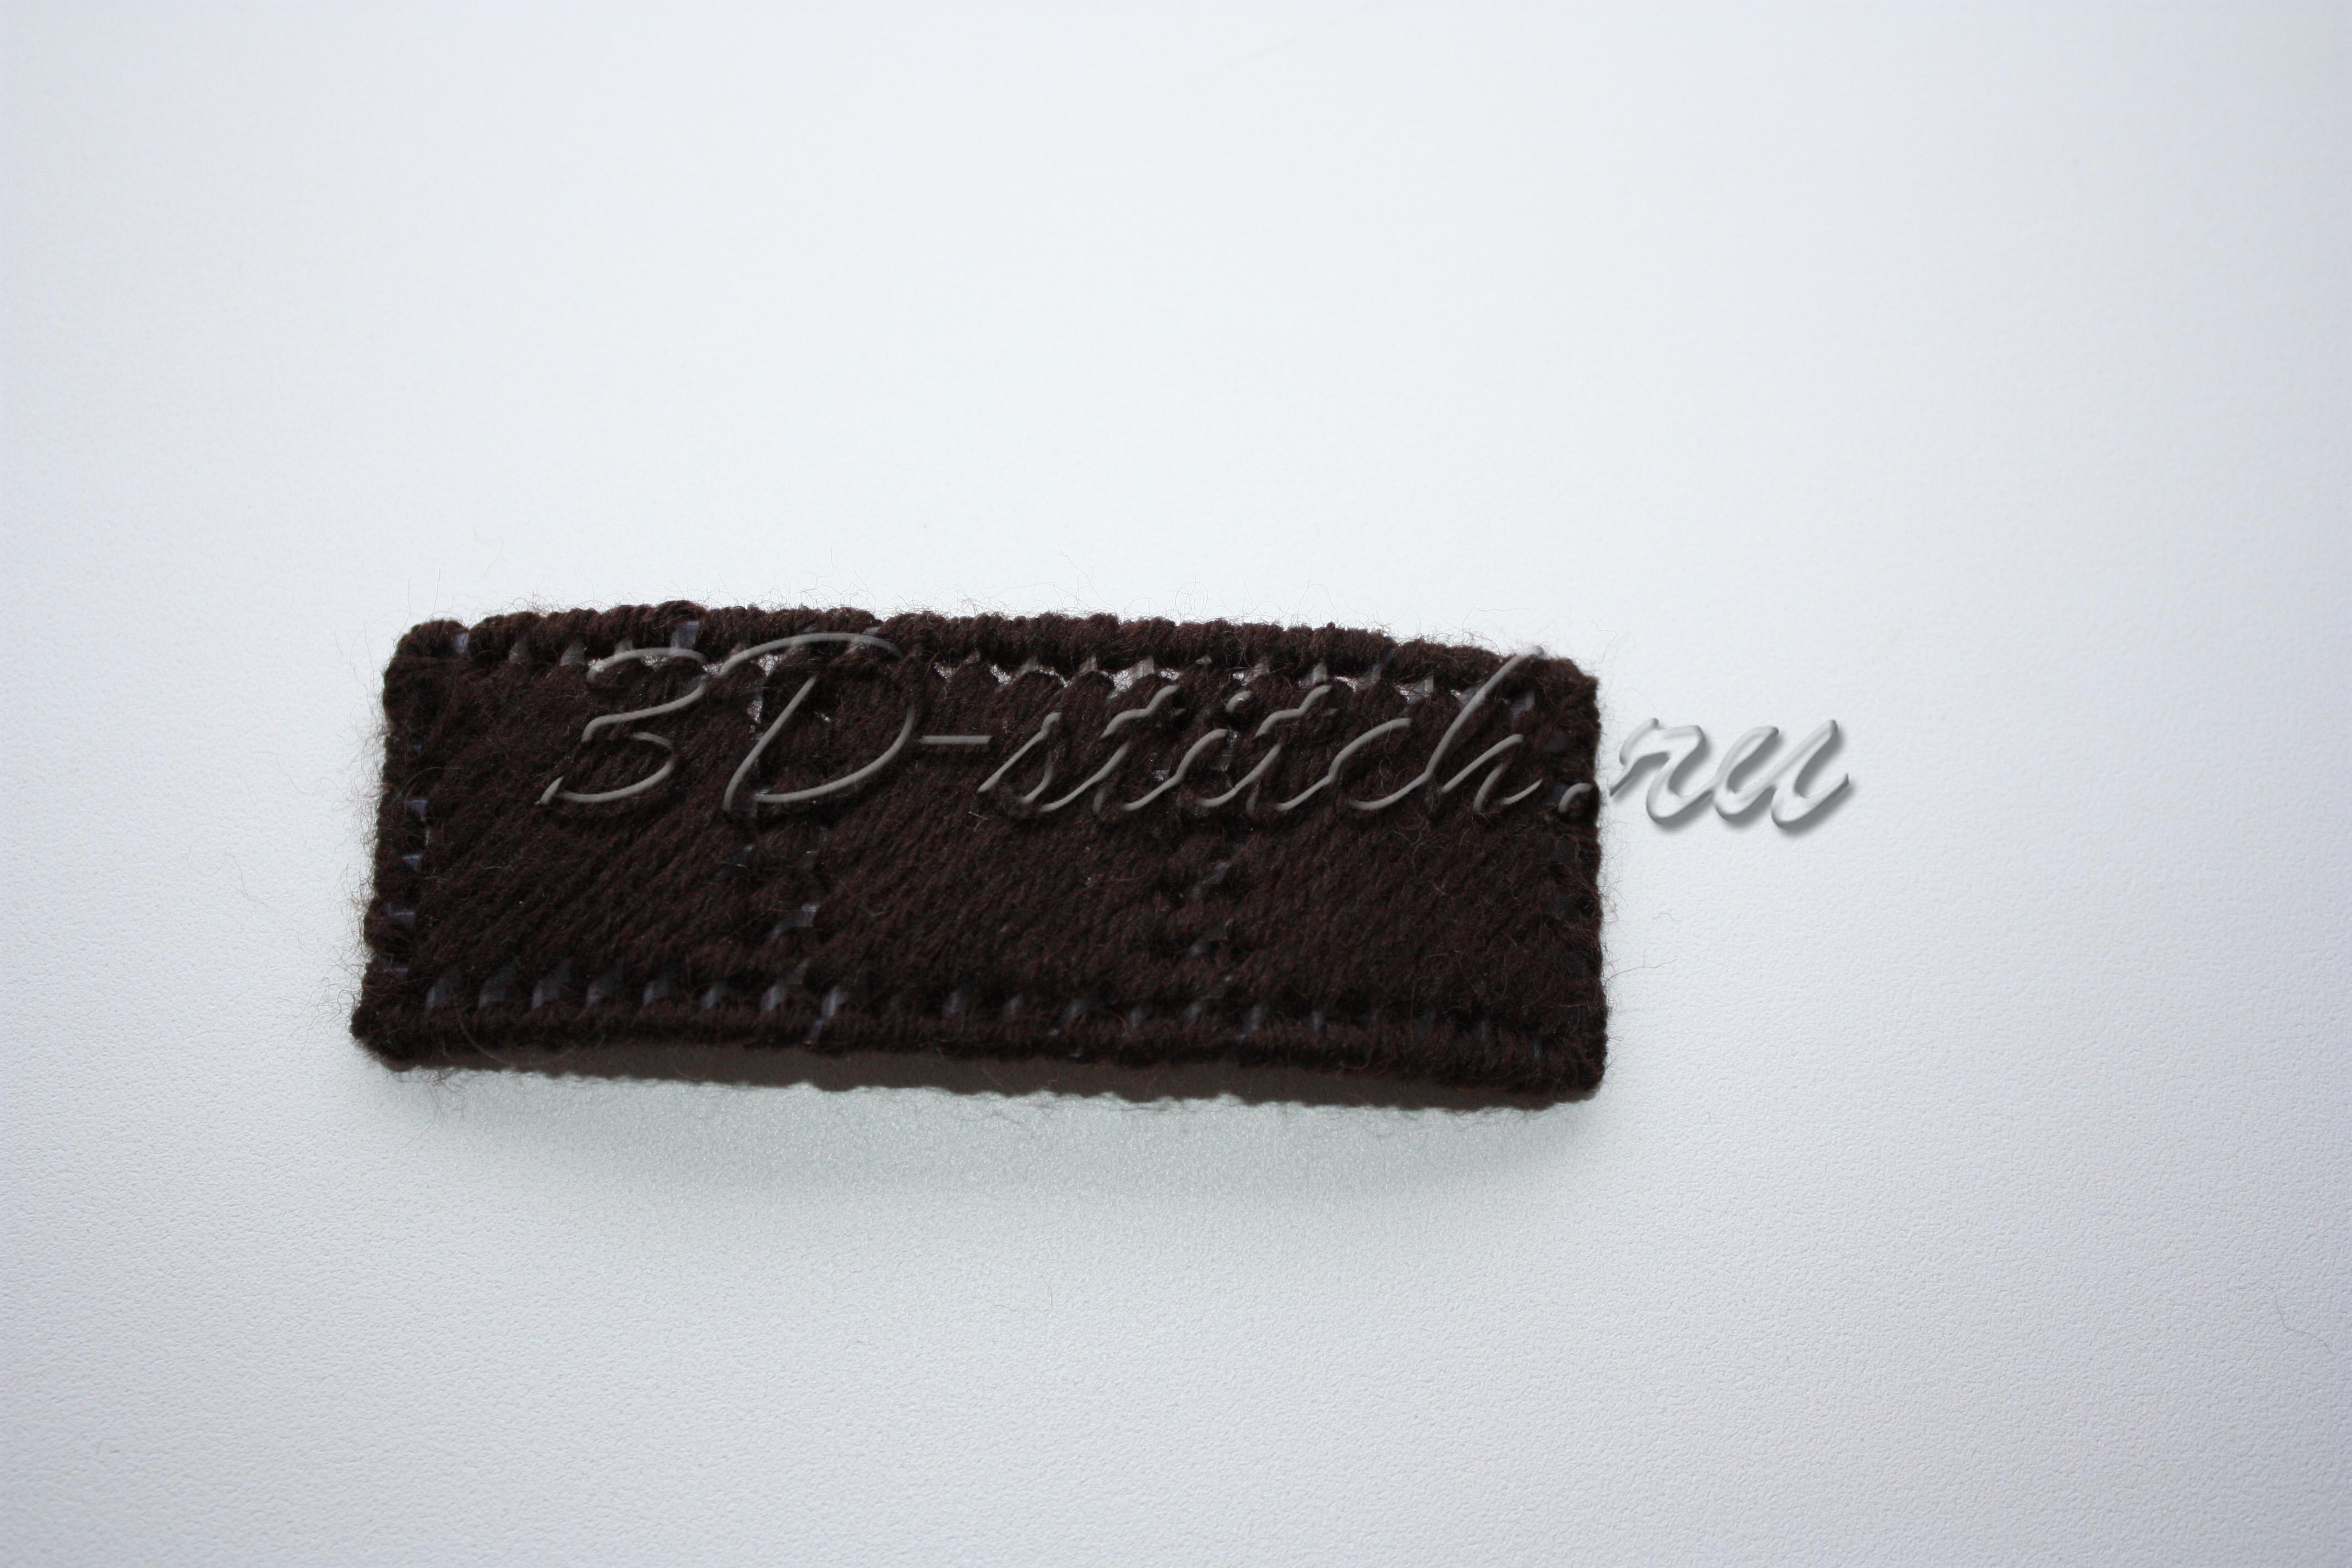 Объемная вышивка - мастер-класс - Вышитая шкатулка - Этап 3 - Готовая деталь бантика